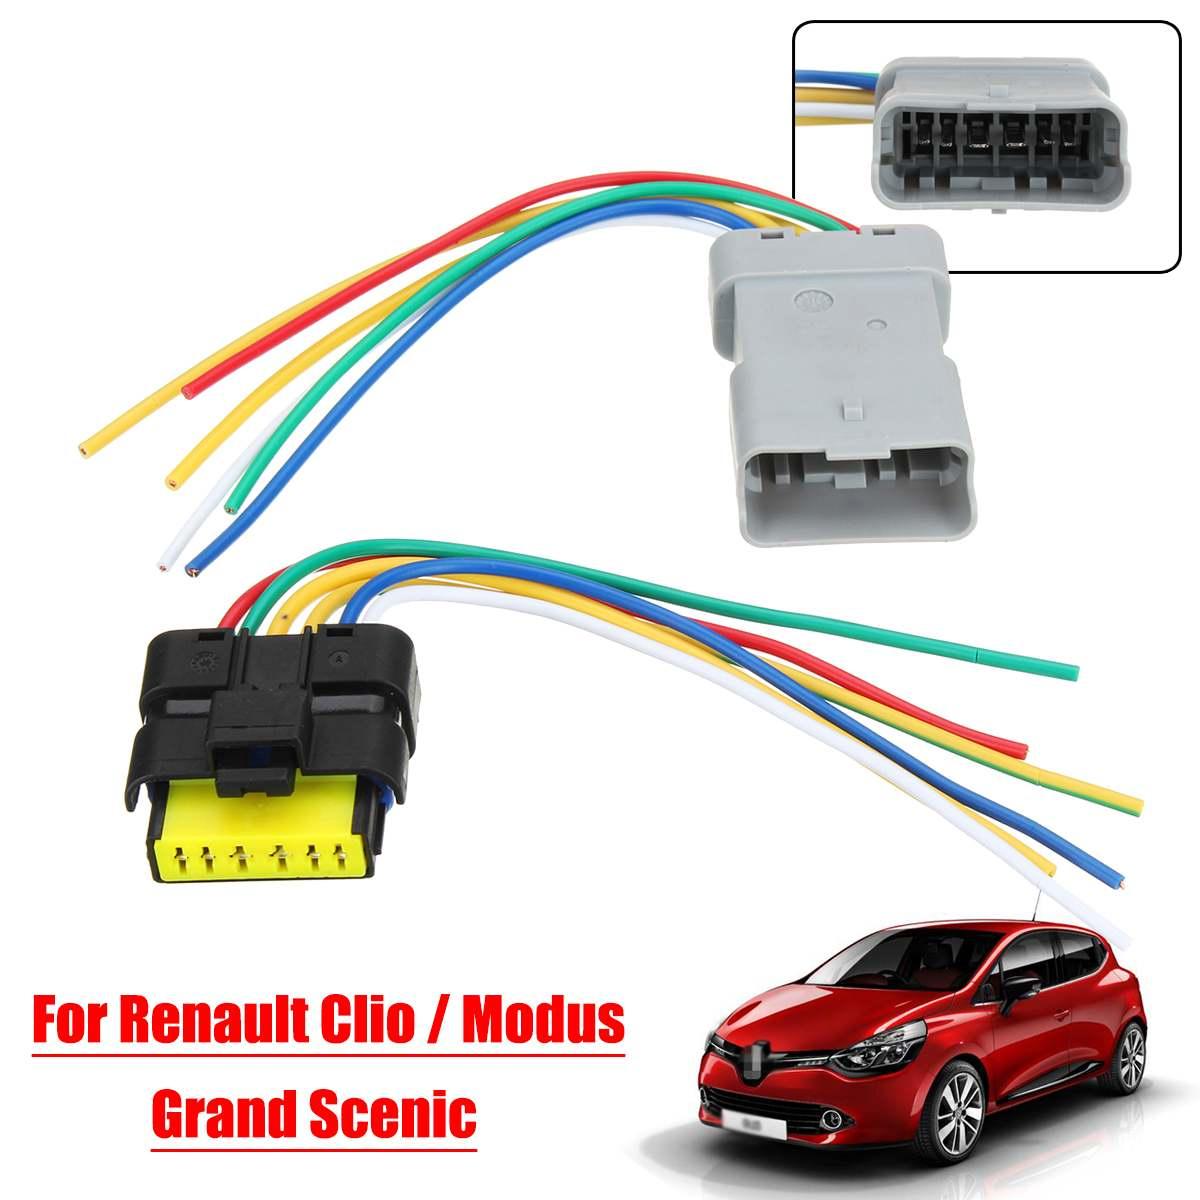 1set Window Module Wiring Ponytail Harness Plastic Plug For Renault Clio Grand Scenic Modus